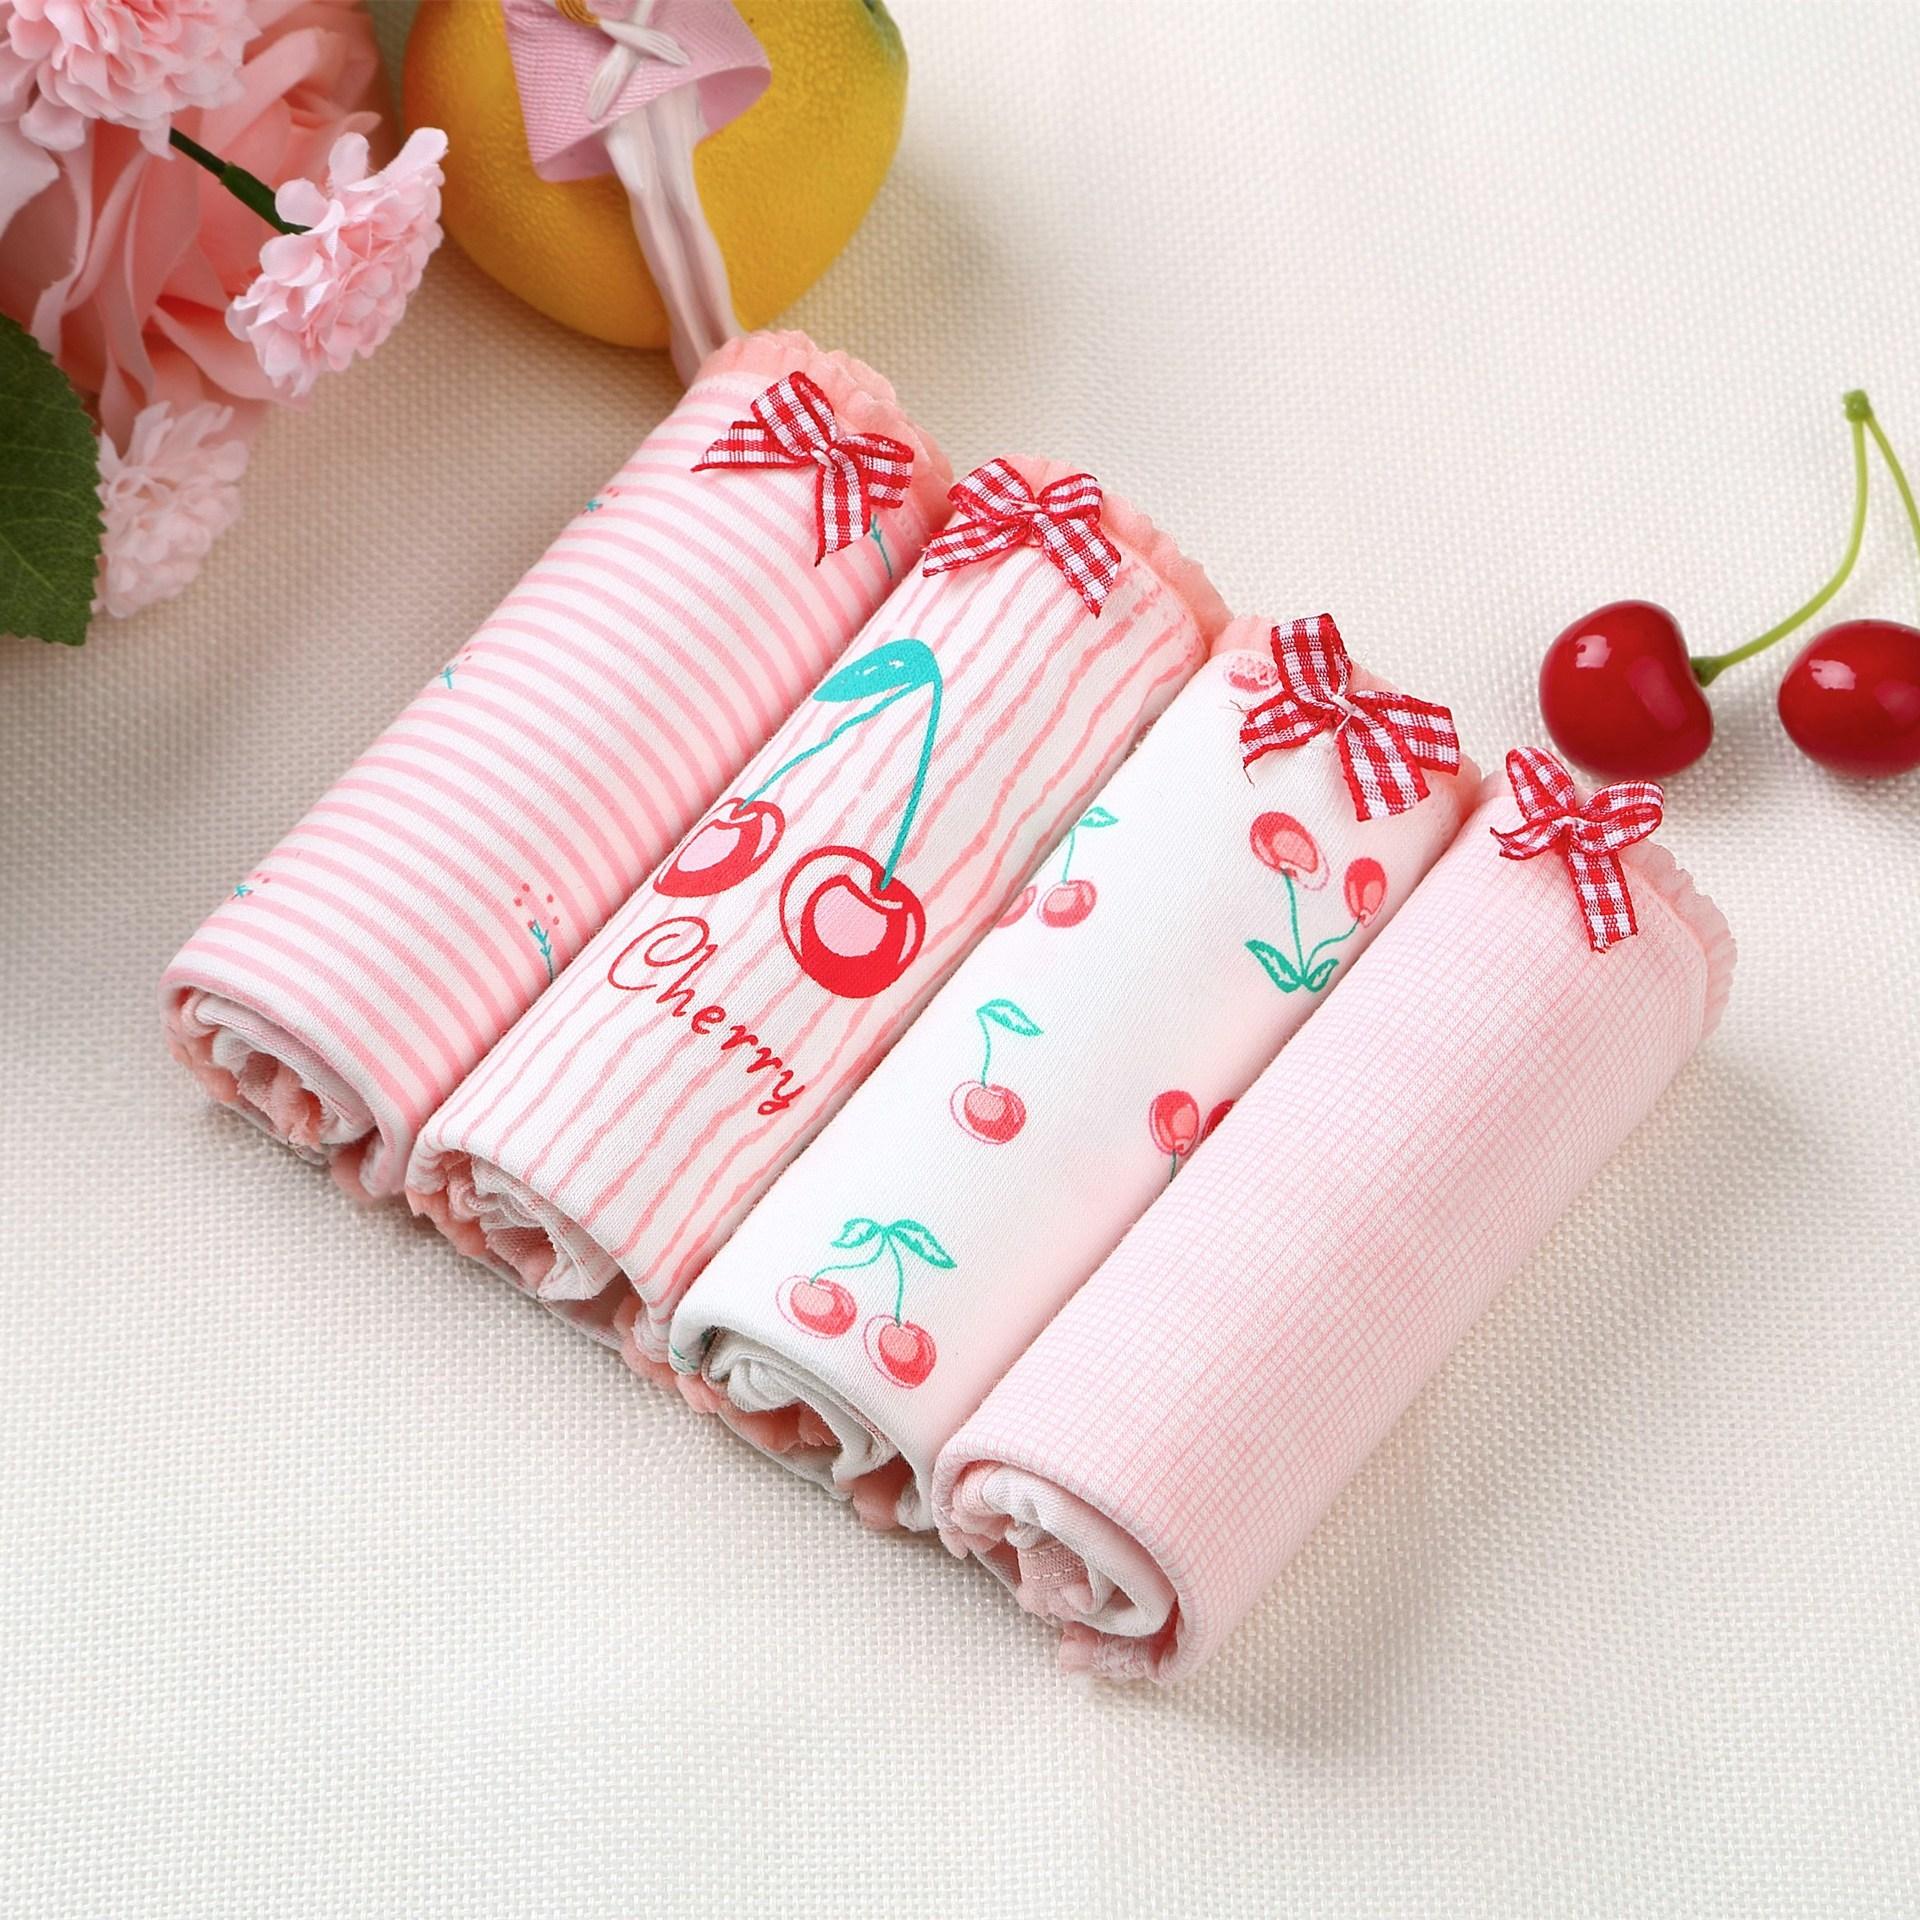 Women's   panties   cotton gril briefs Strawberry watermelon cherry print underwear female sexy lingerie ladies underpants 2019